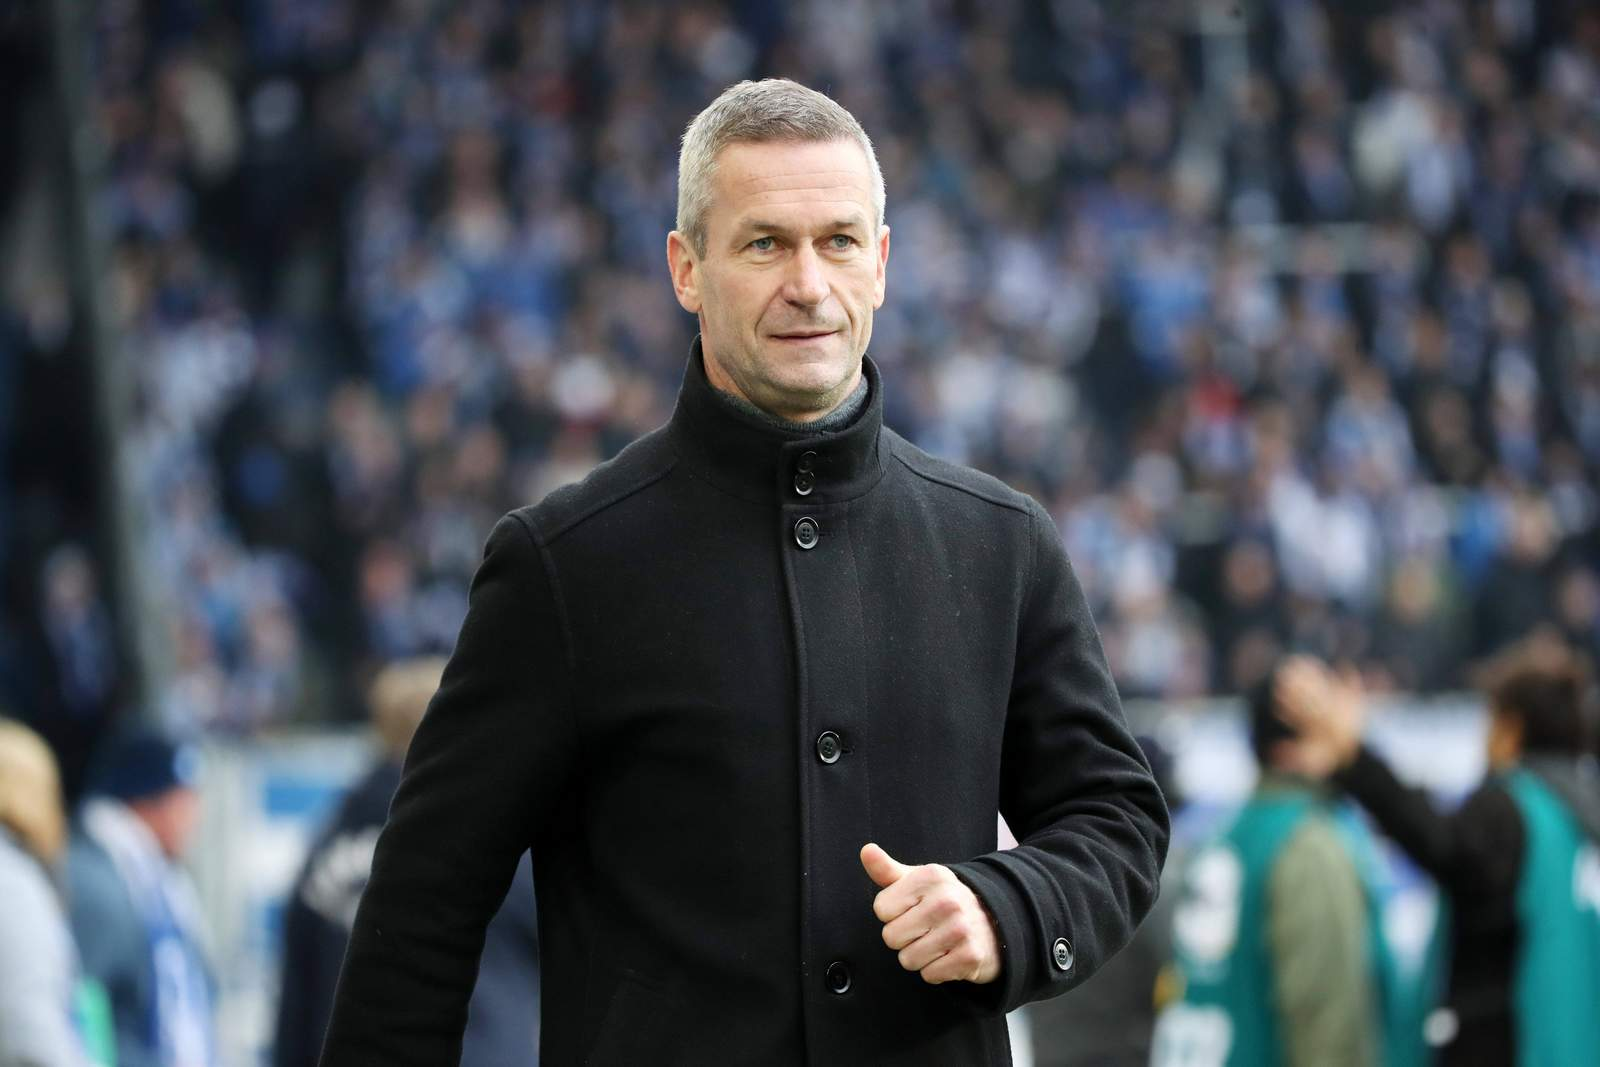 Mario Kallnik beim 1. FC Magdeburg